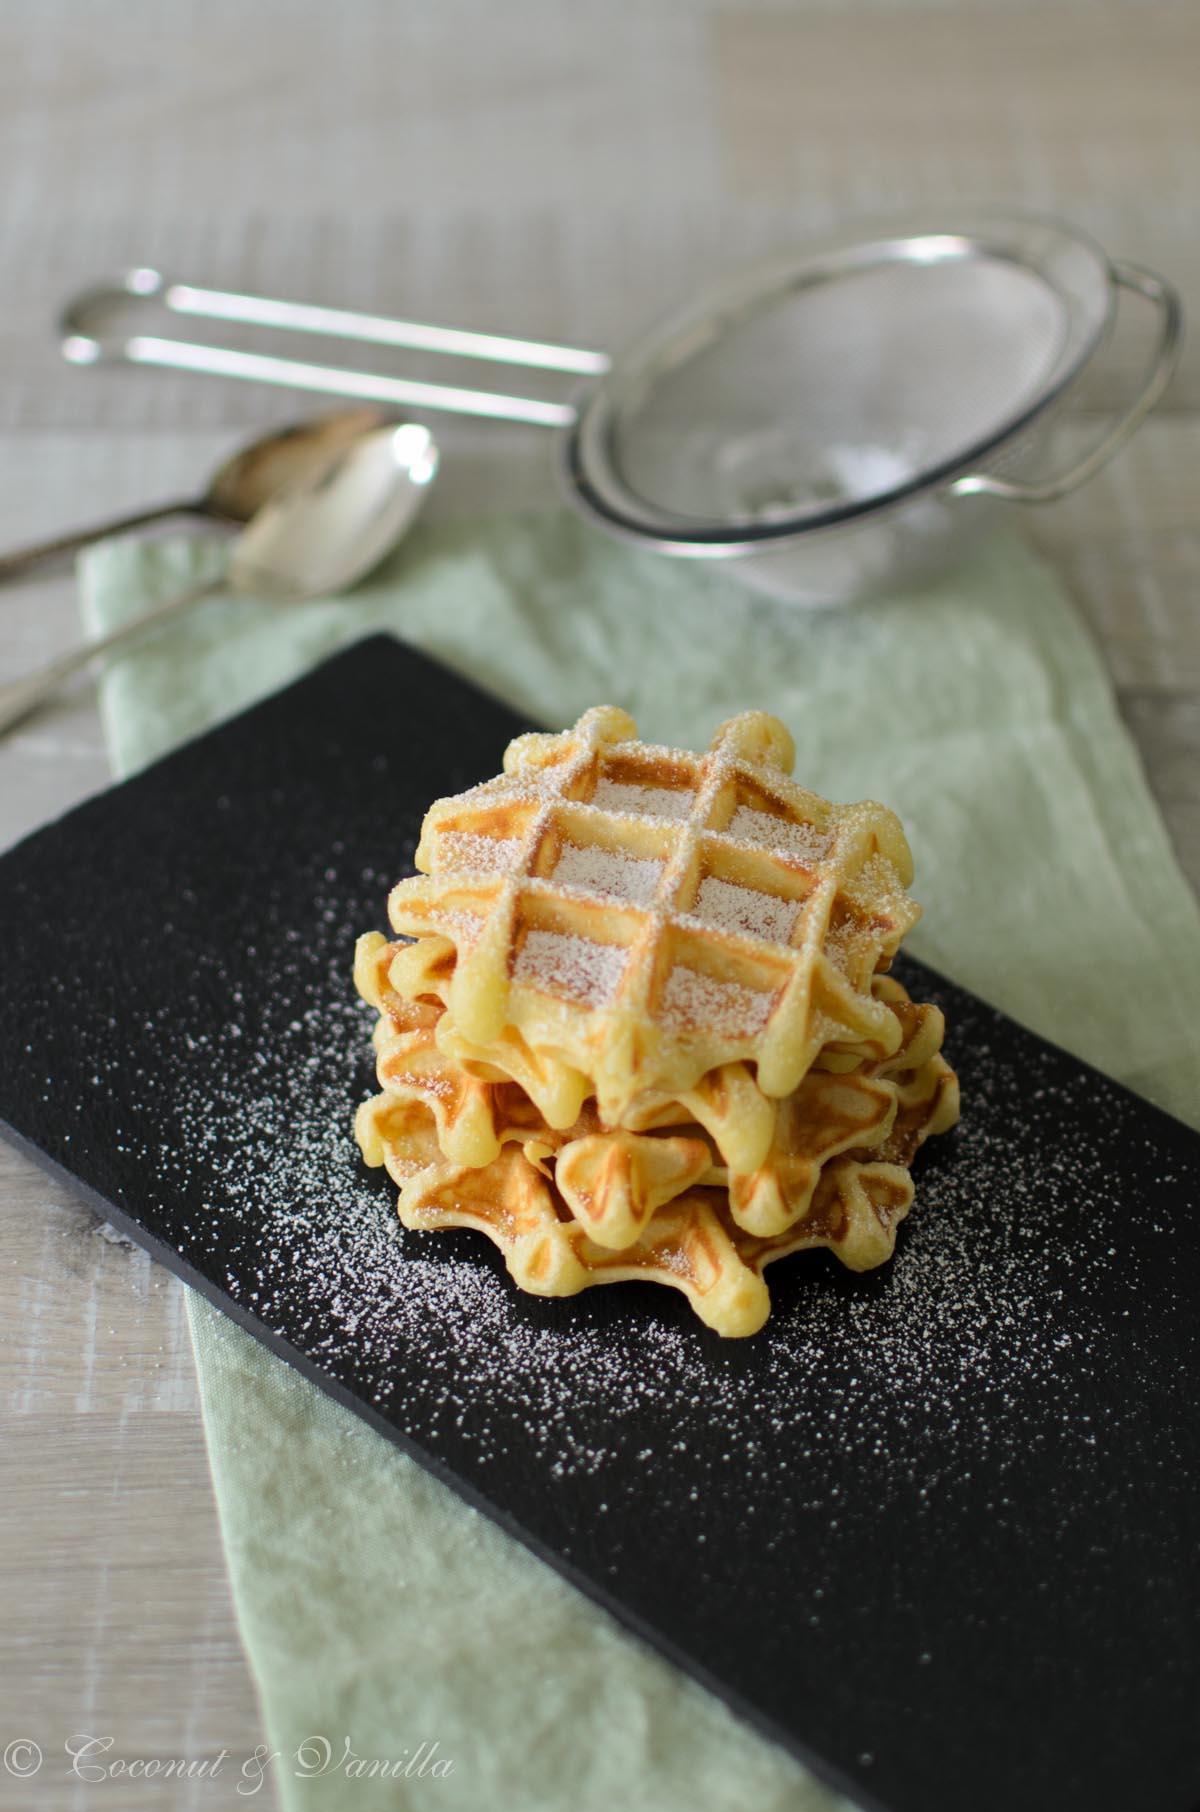 Luscious Yeast Waffles